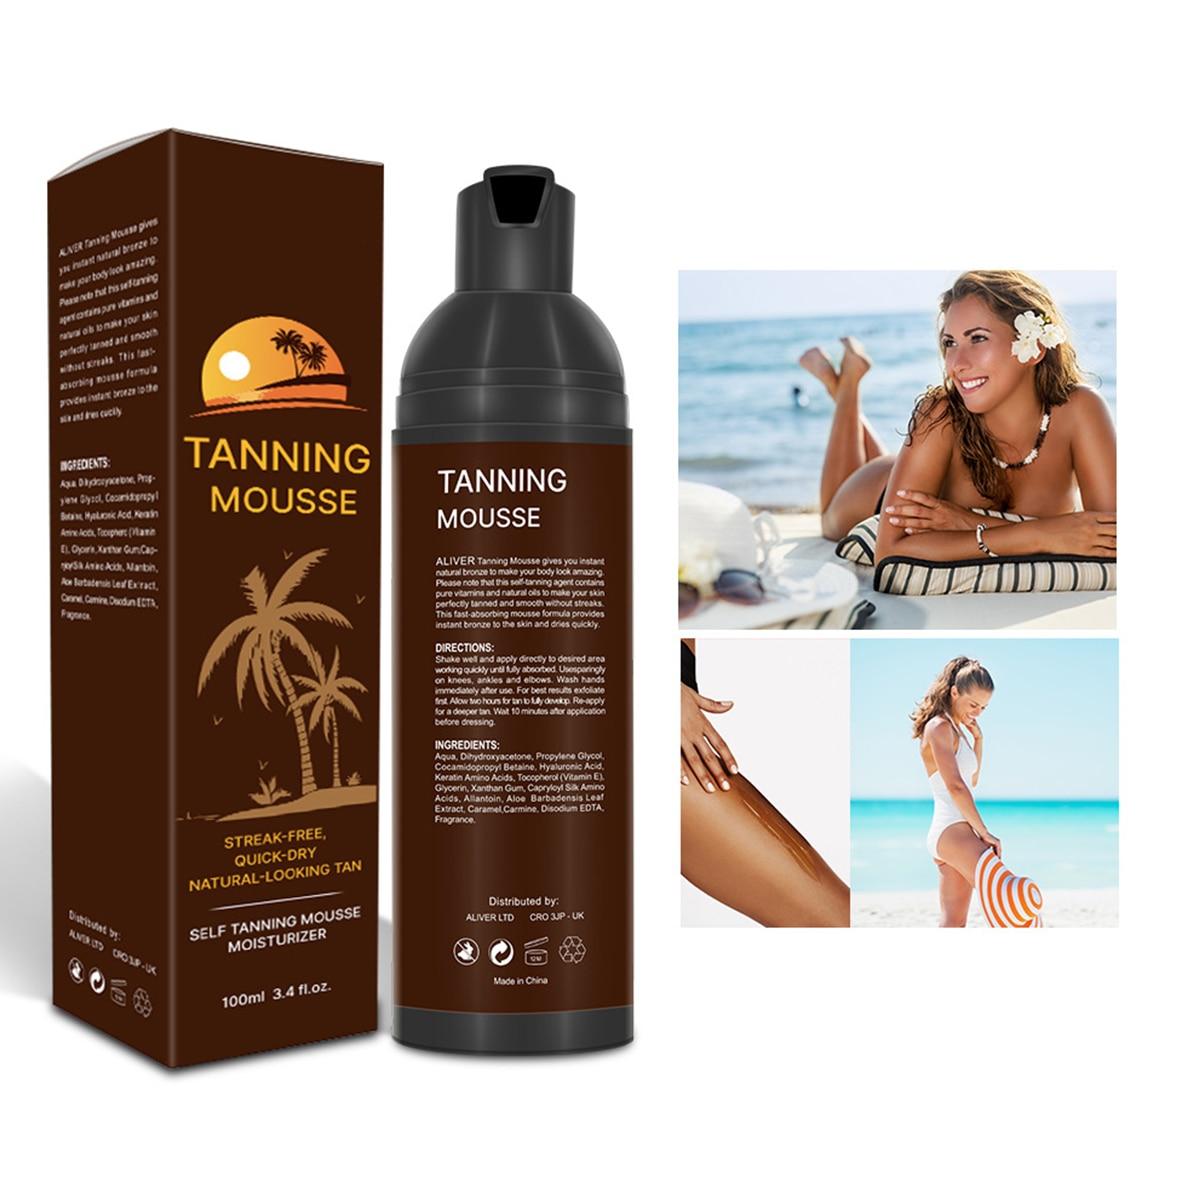 Men Women Self Tanning Mousse Fast-Dry Body Bronzer Darker Sunless Tanning Lotion Cream Fast Absorption Moisturizing Sunscreen